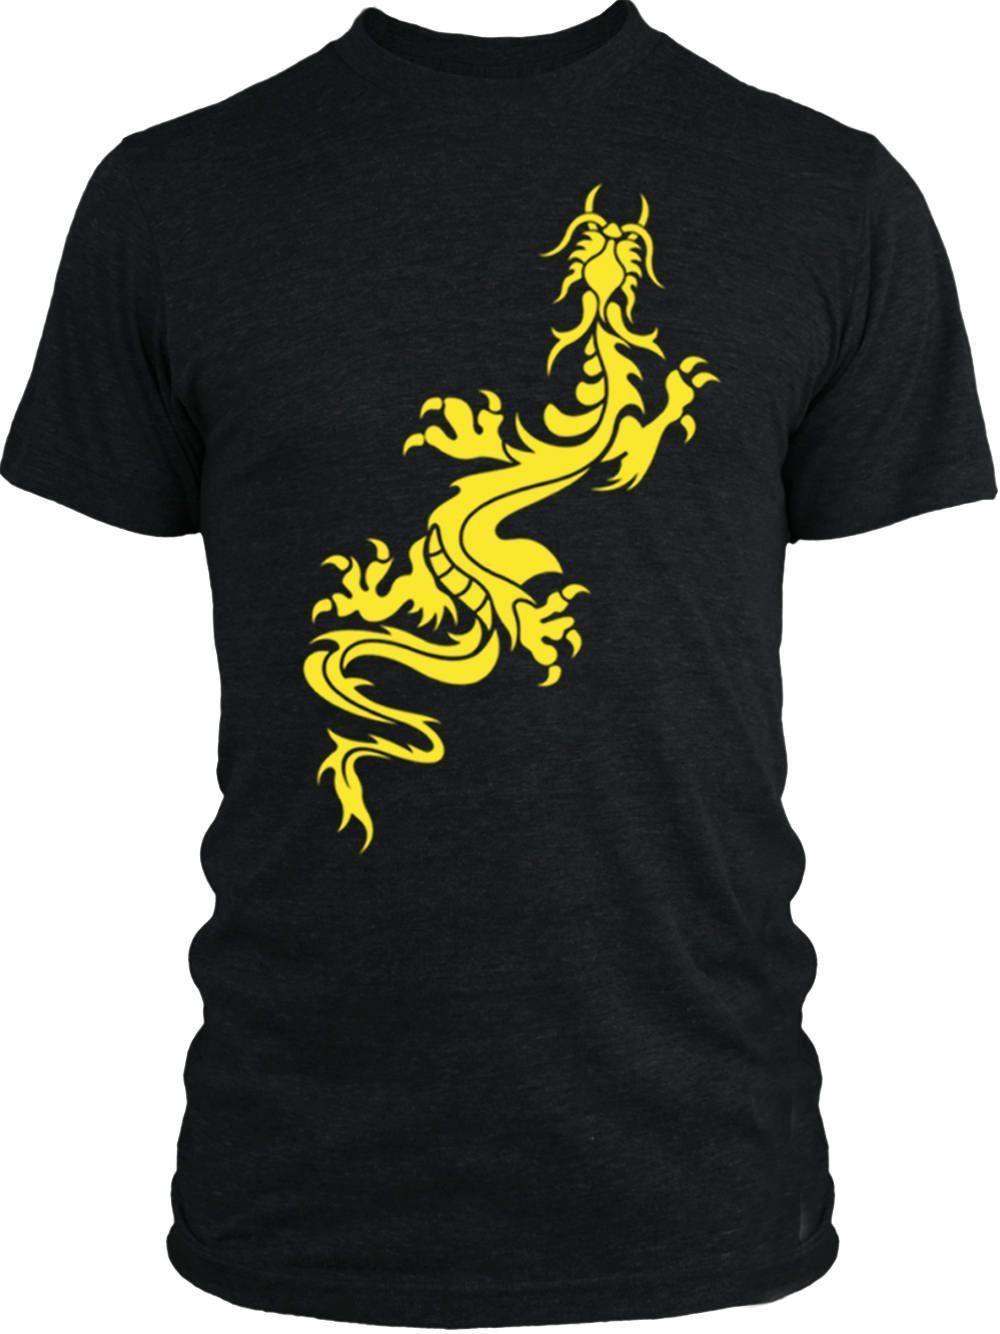 Big Texas Dragon Stencil (Yellow) Vintage Tri-Blend T-Shirt